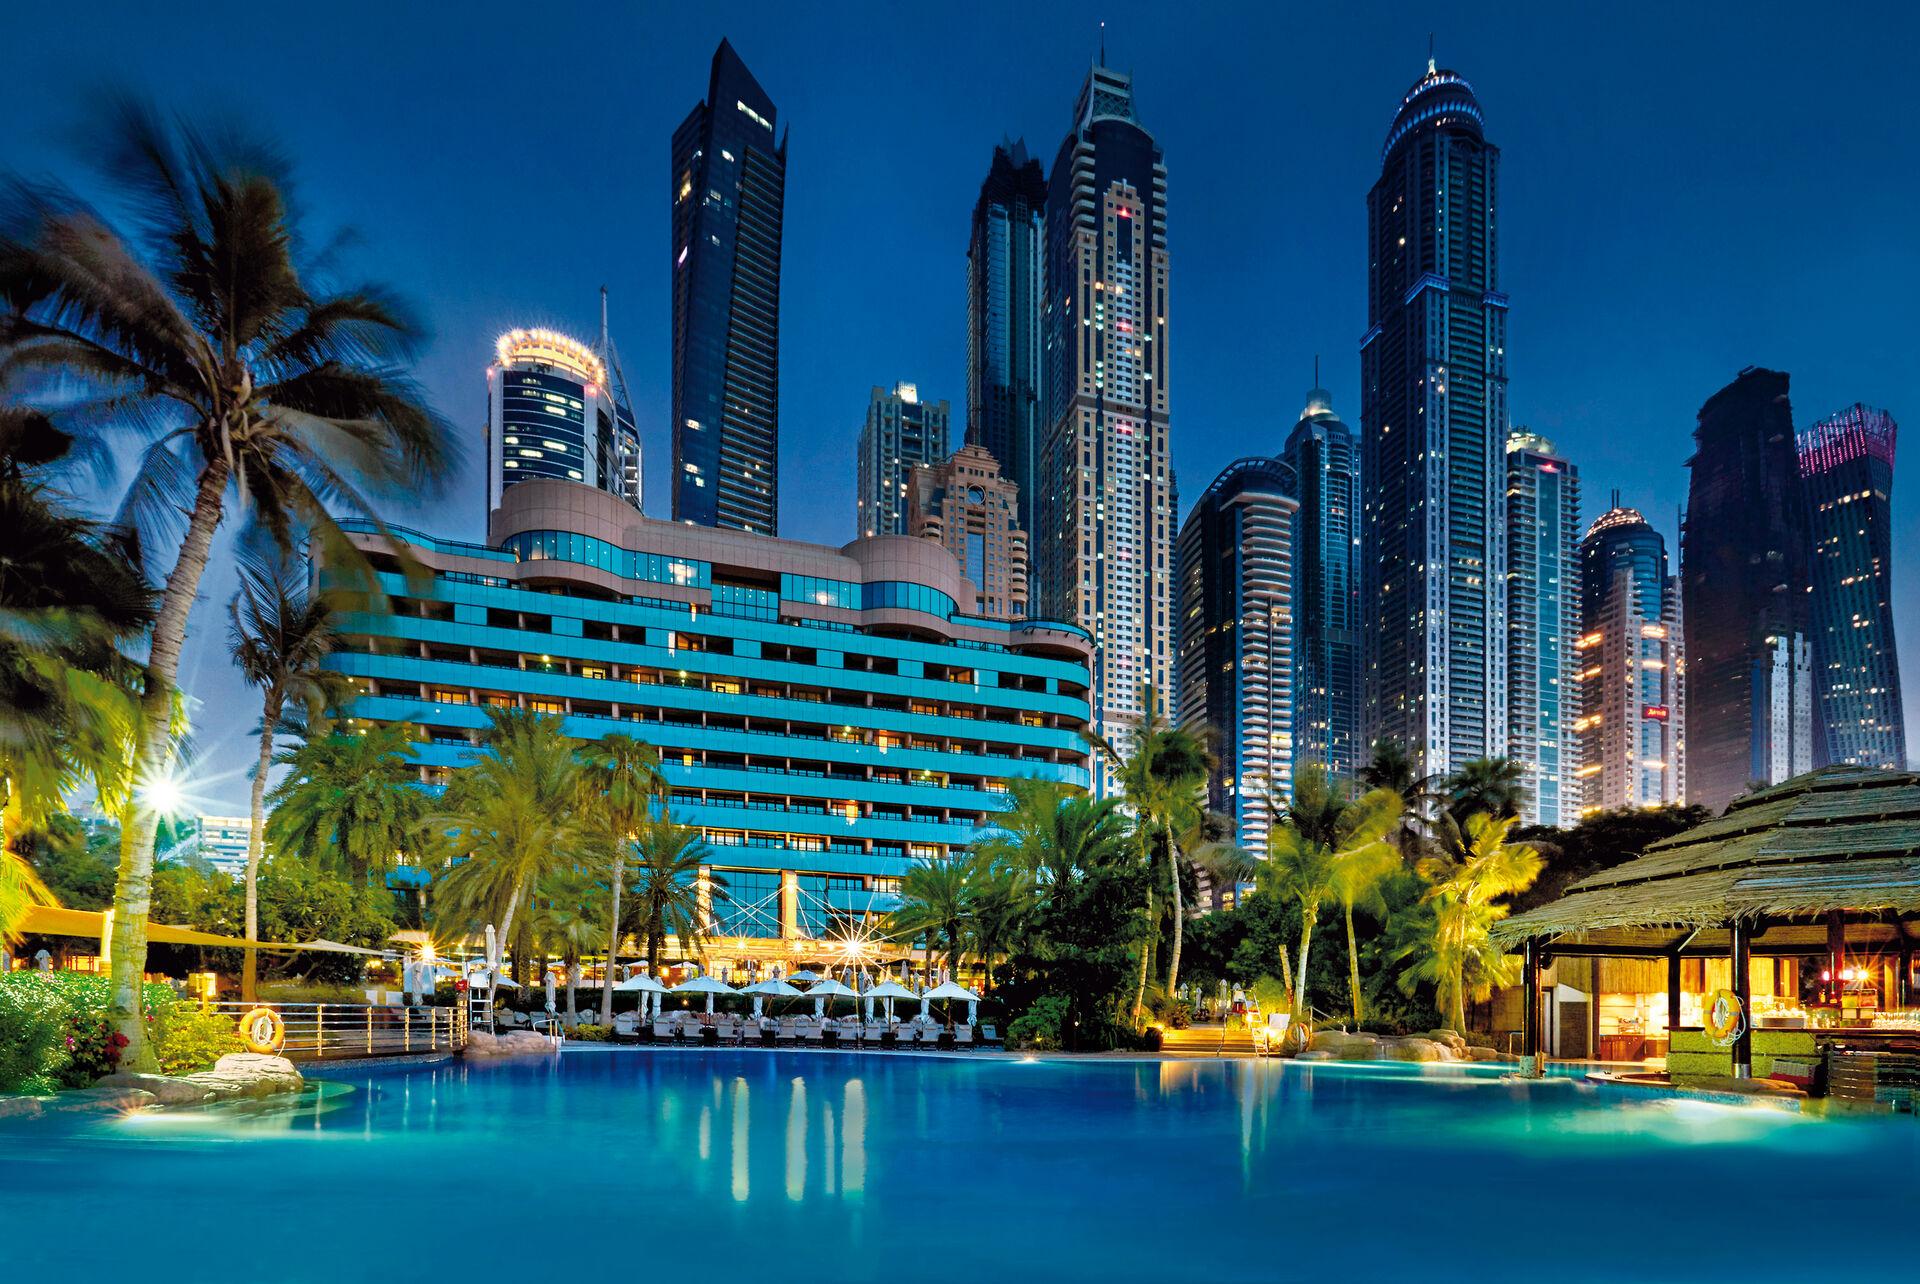 Séjour Emirats Arabes Unis - Le Meridien Mina Seyahi Beach Resort - 5*